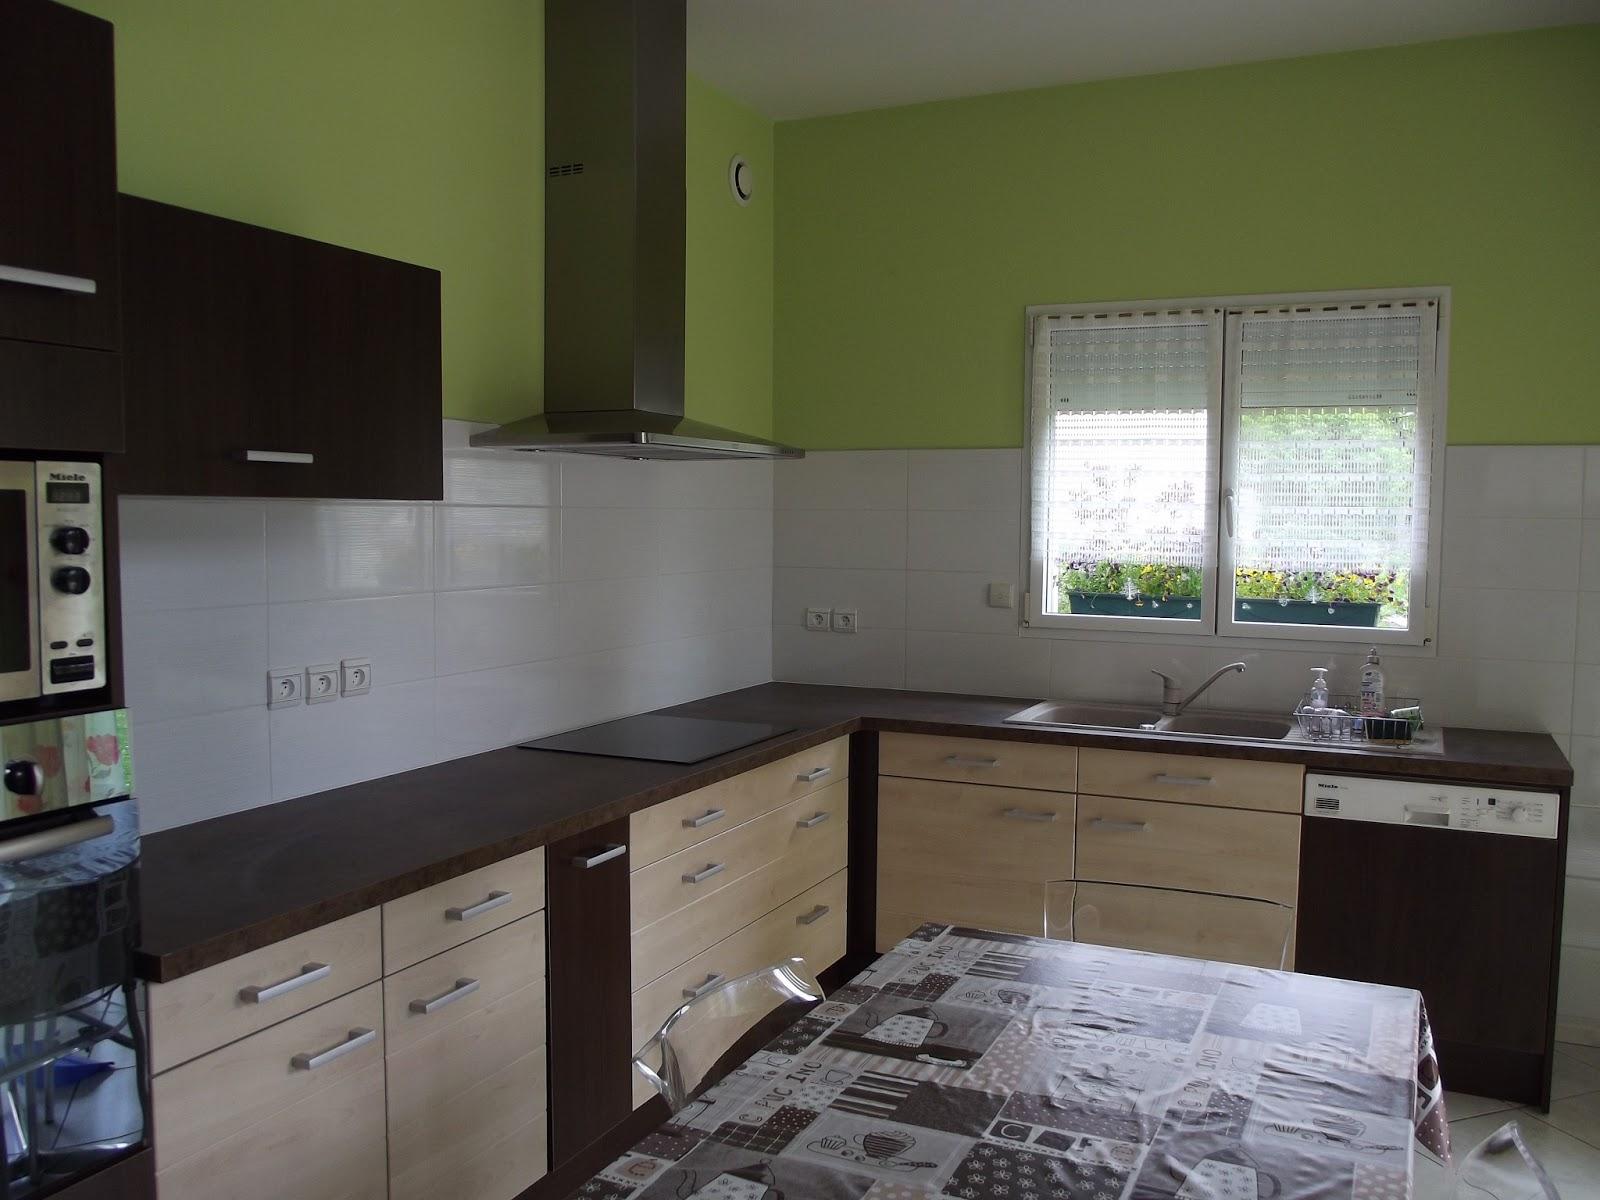 credence blanche meilleures images d 39 inspiration pour. Black Bedroom Furniture Sets. Home Design Ideas